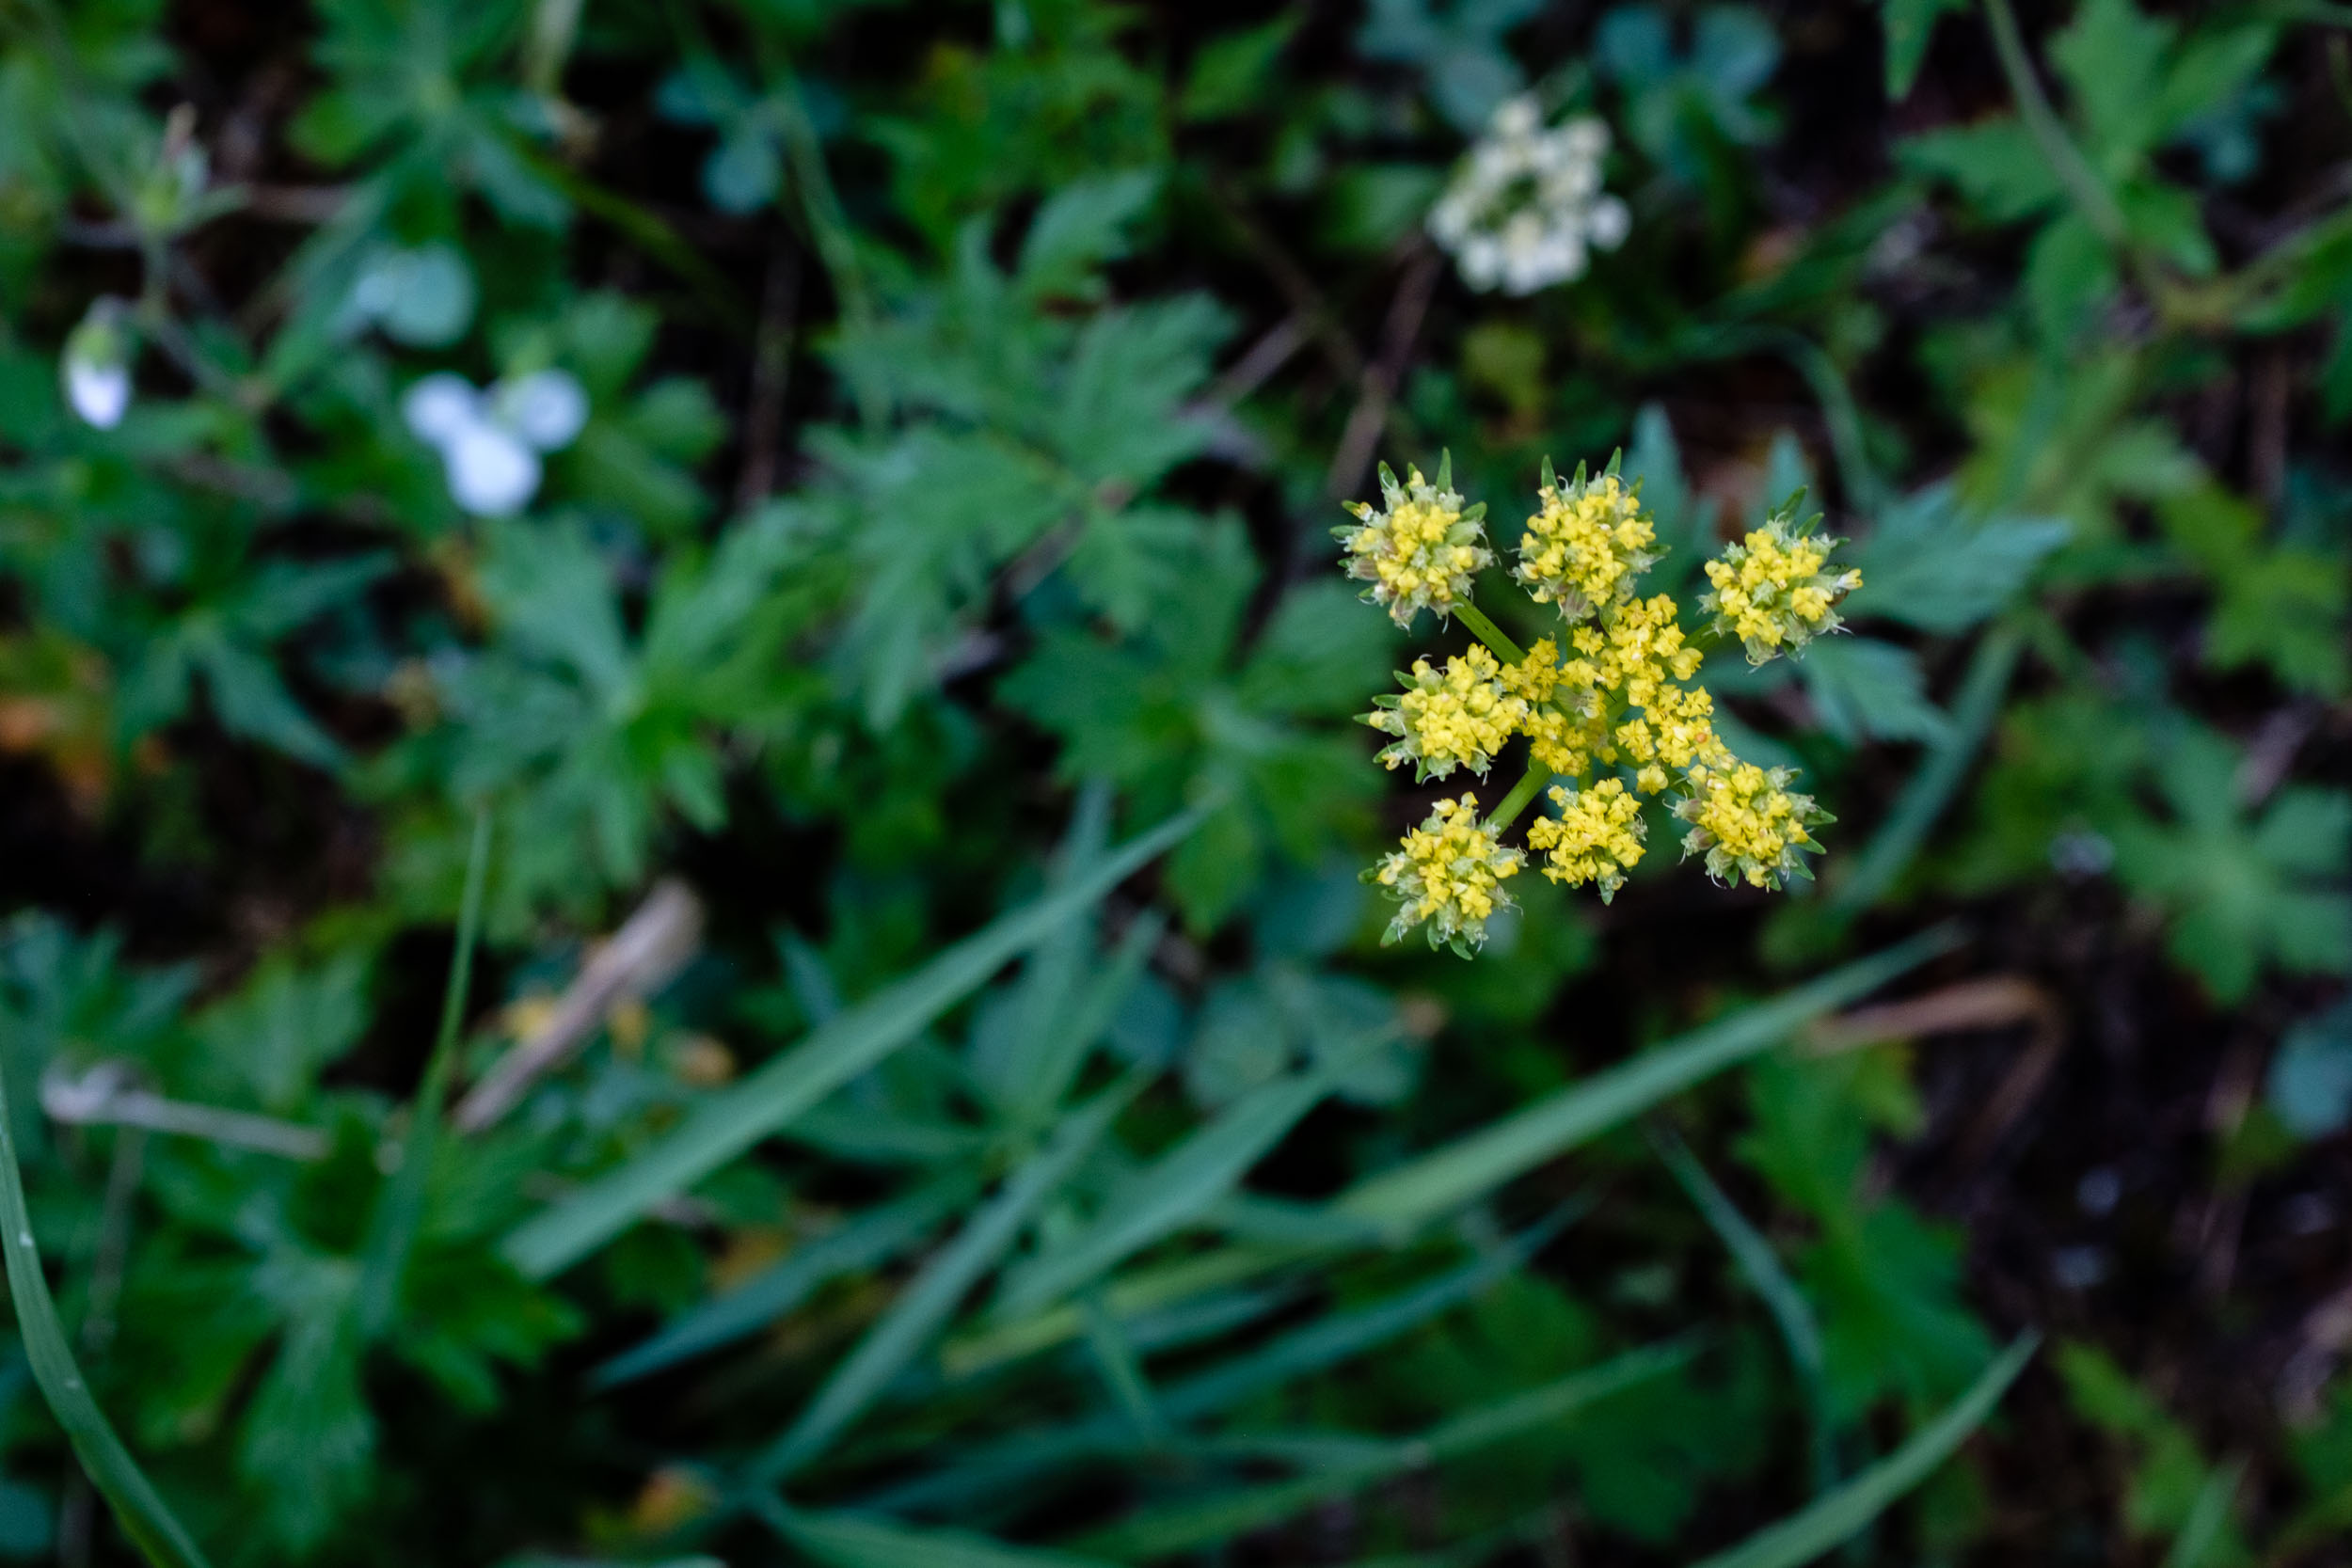 Delicate Yellow Blooms - Fuji XT2, 23mm f/2